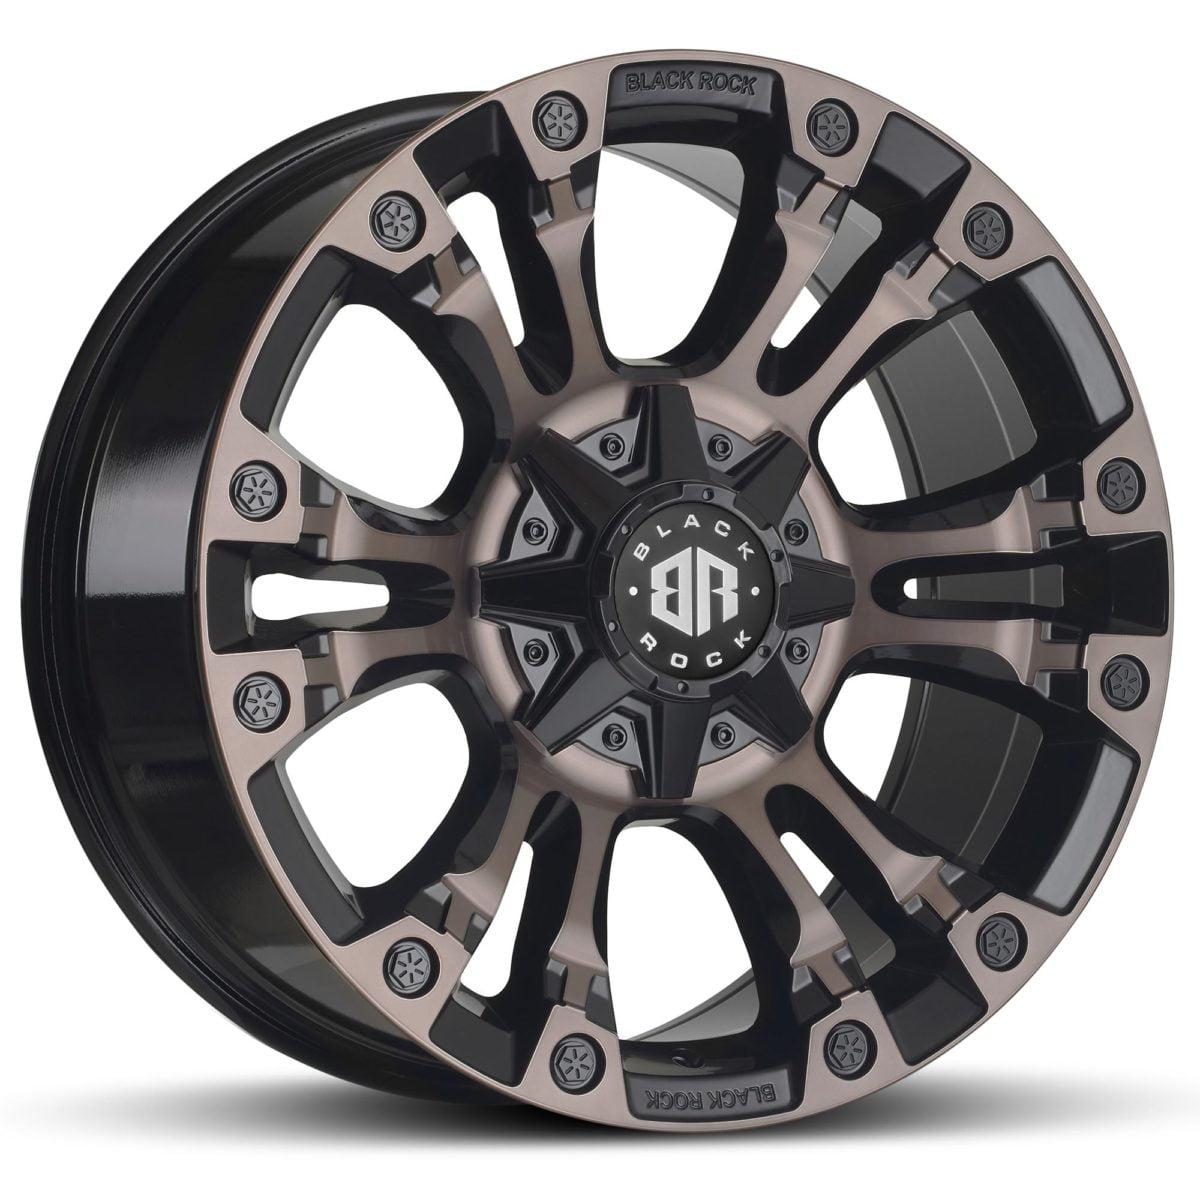 Black Rock Forcer Gloss Black Tinted Wheels 4x4 Rims